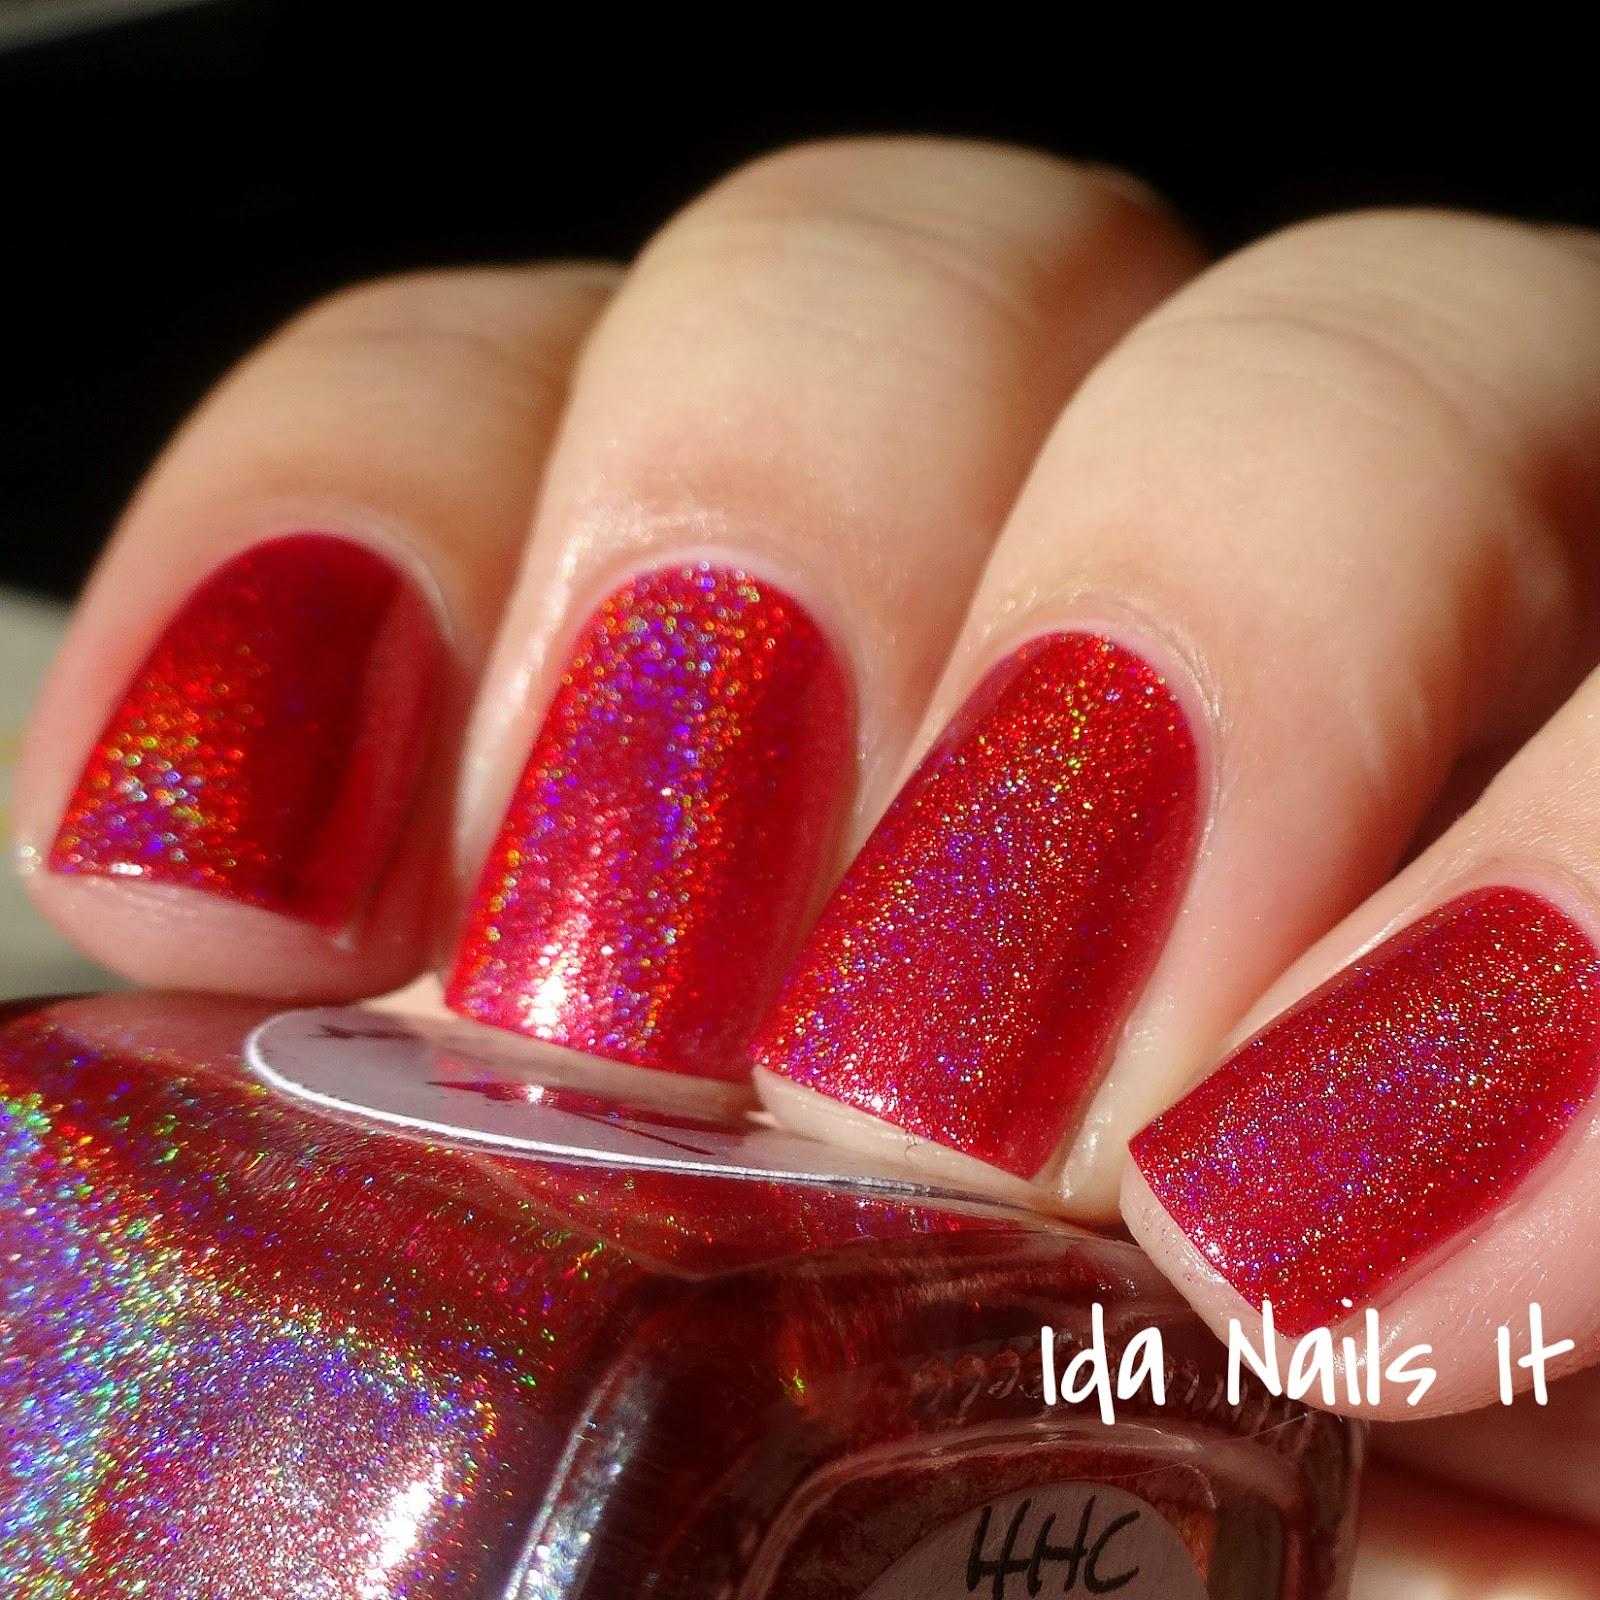 Ida Nails It Hella Holo Customs Halloween True Blood